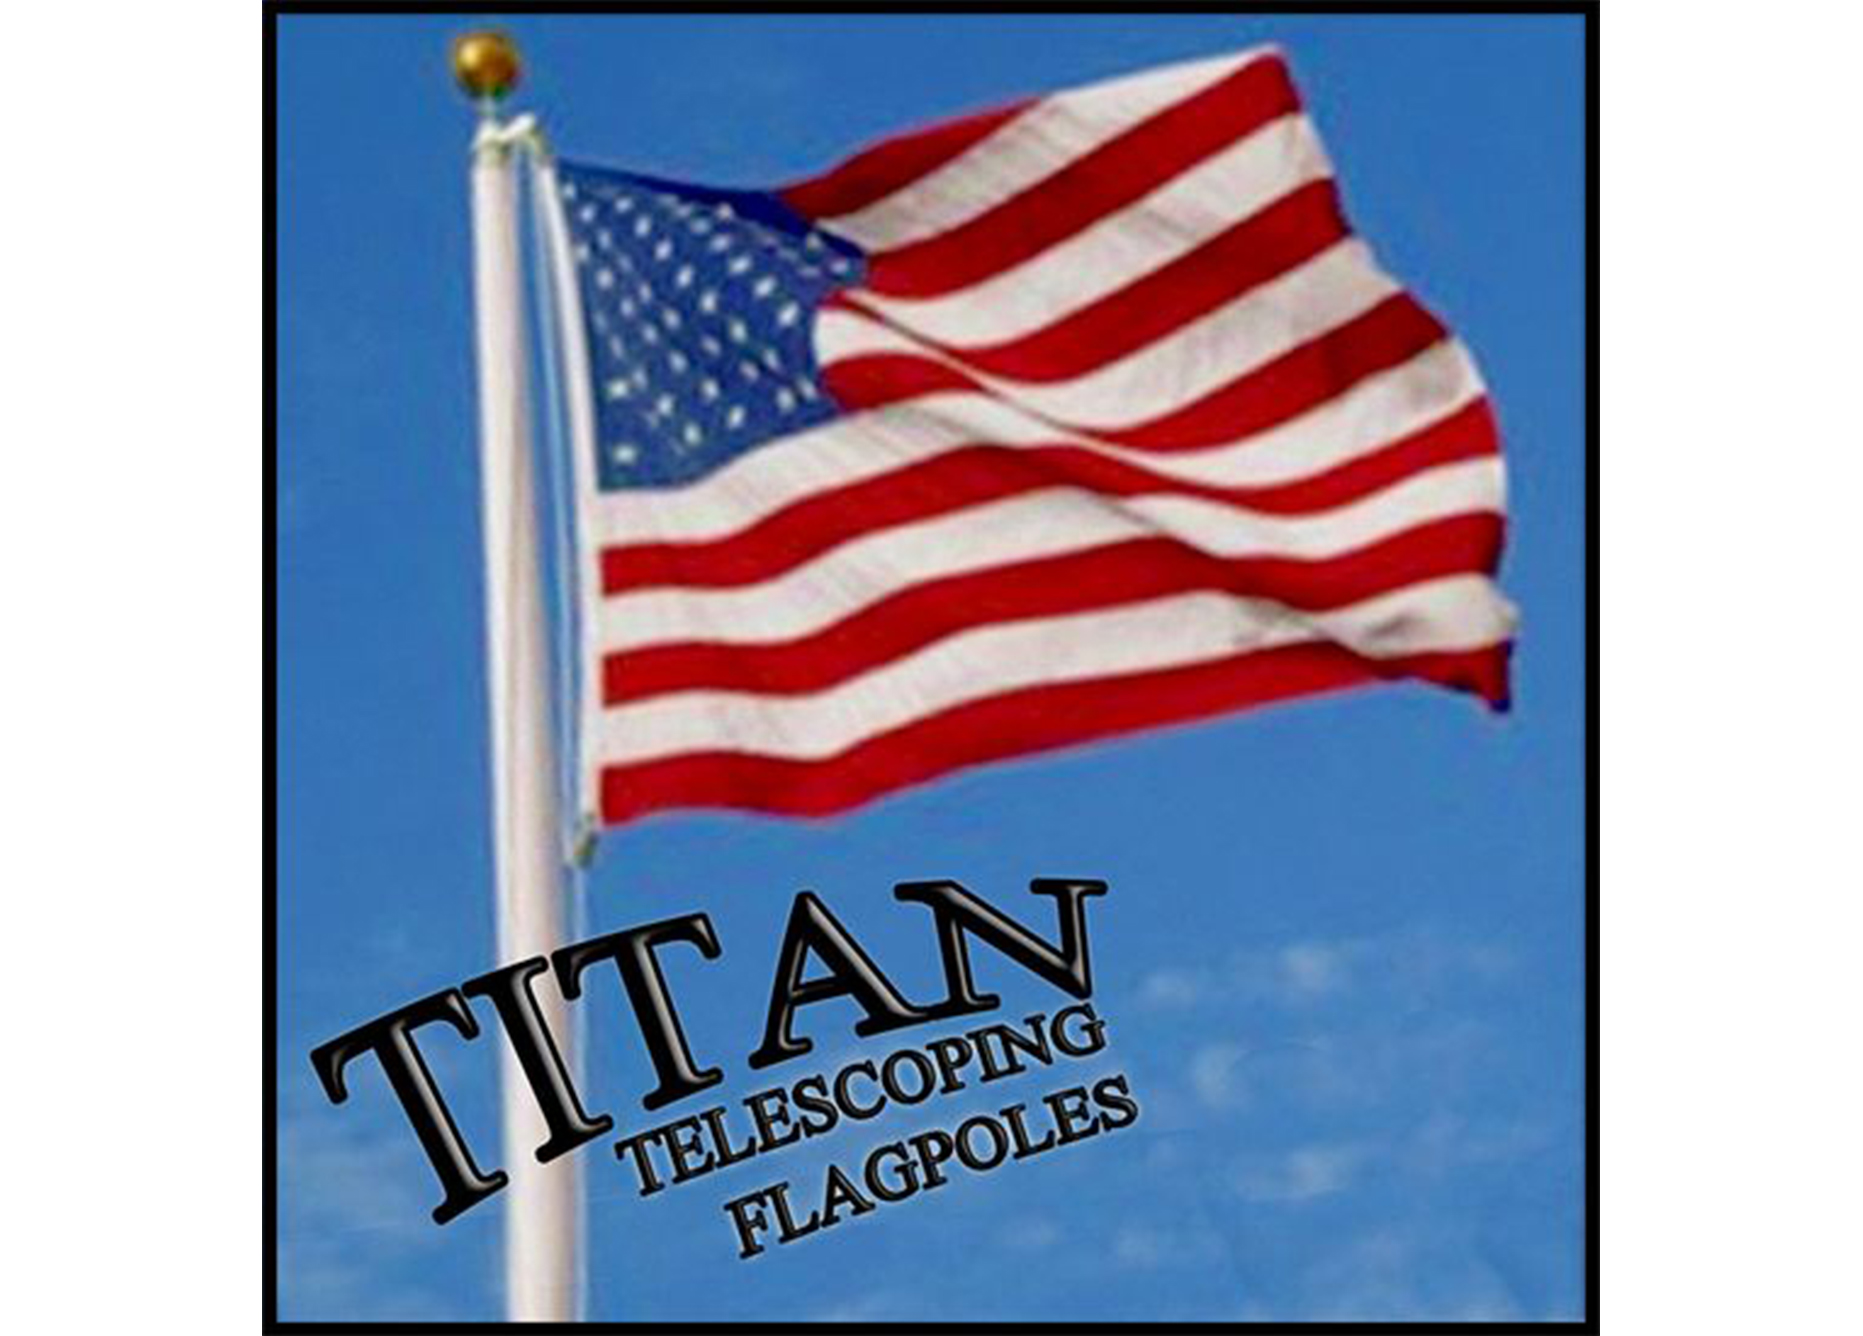 Titan Telescoping flagpole